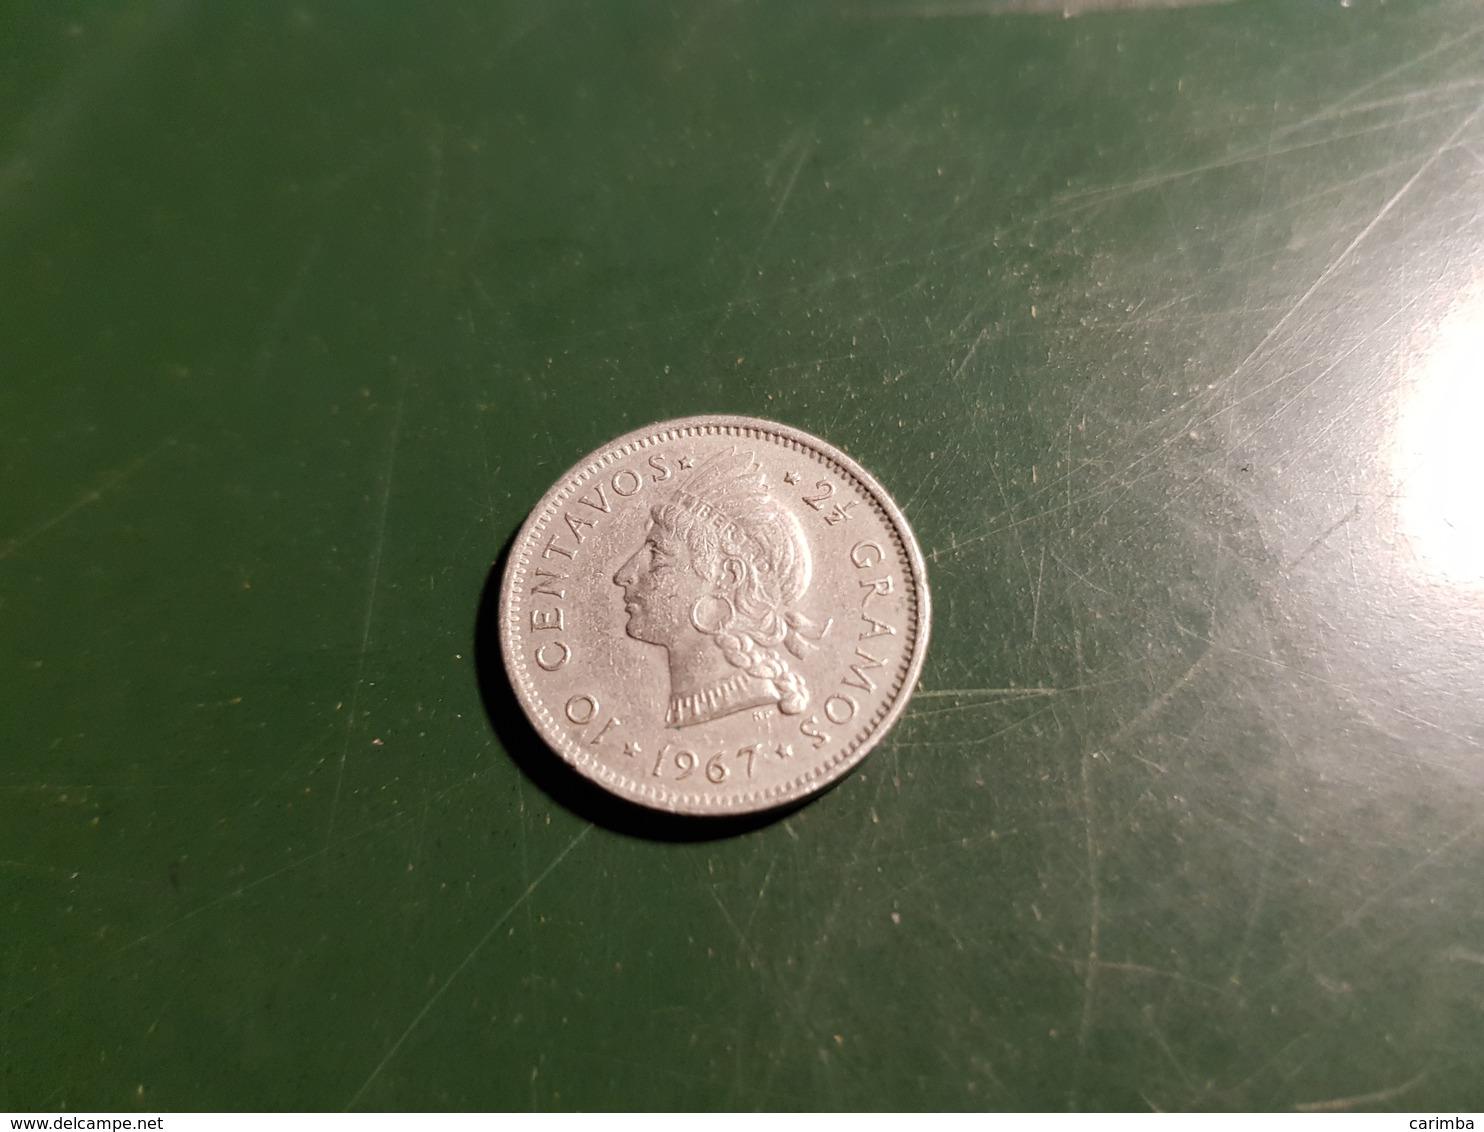 1967 10 Centavos - Dominikanische Rep.